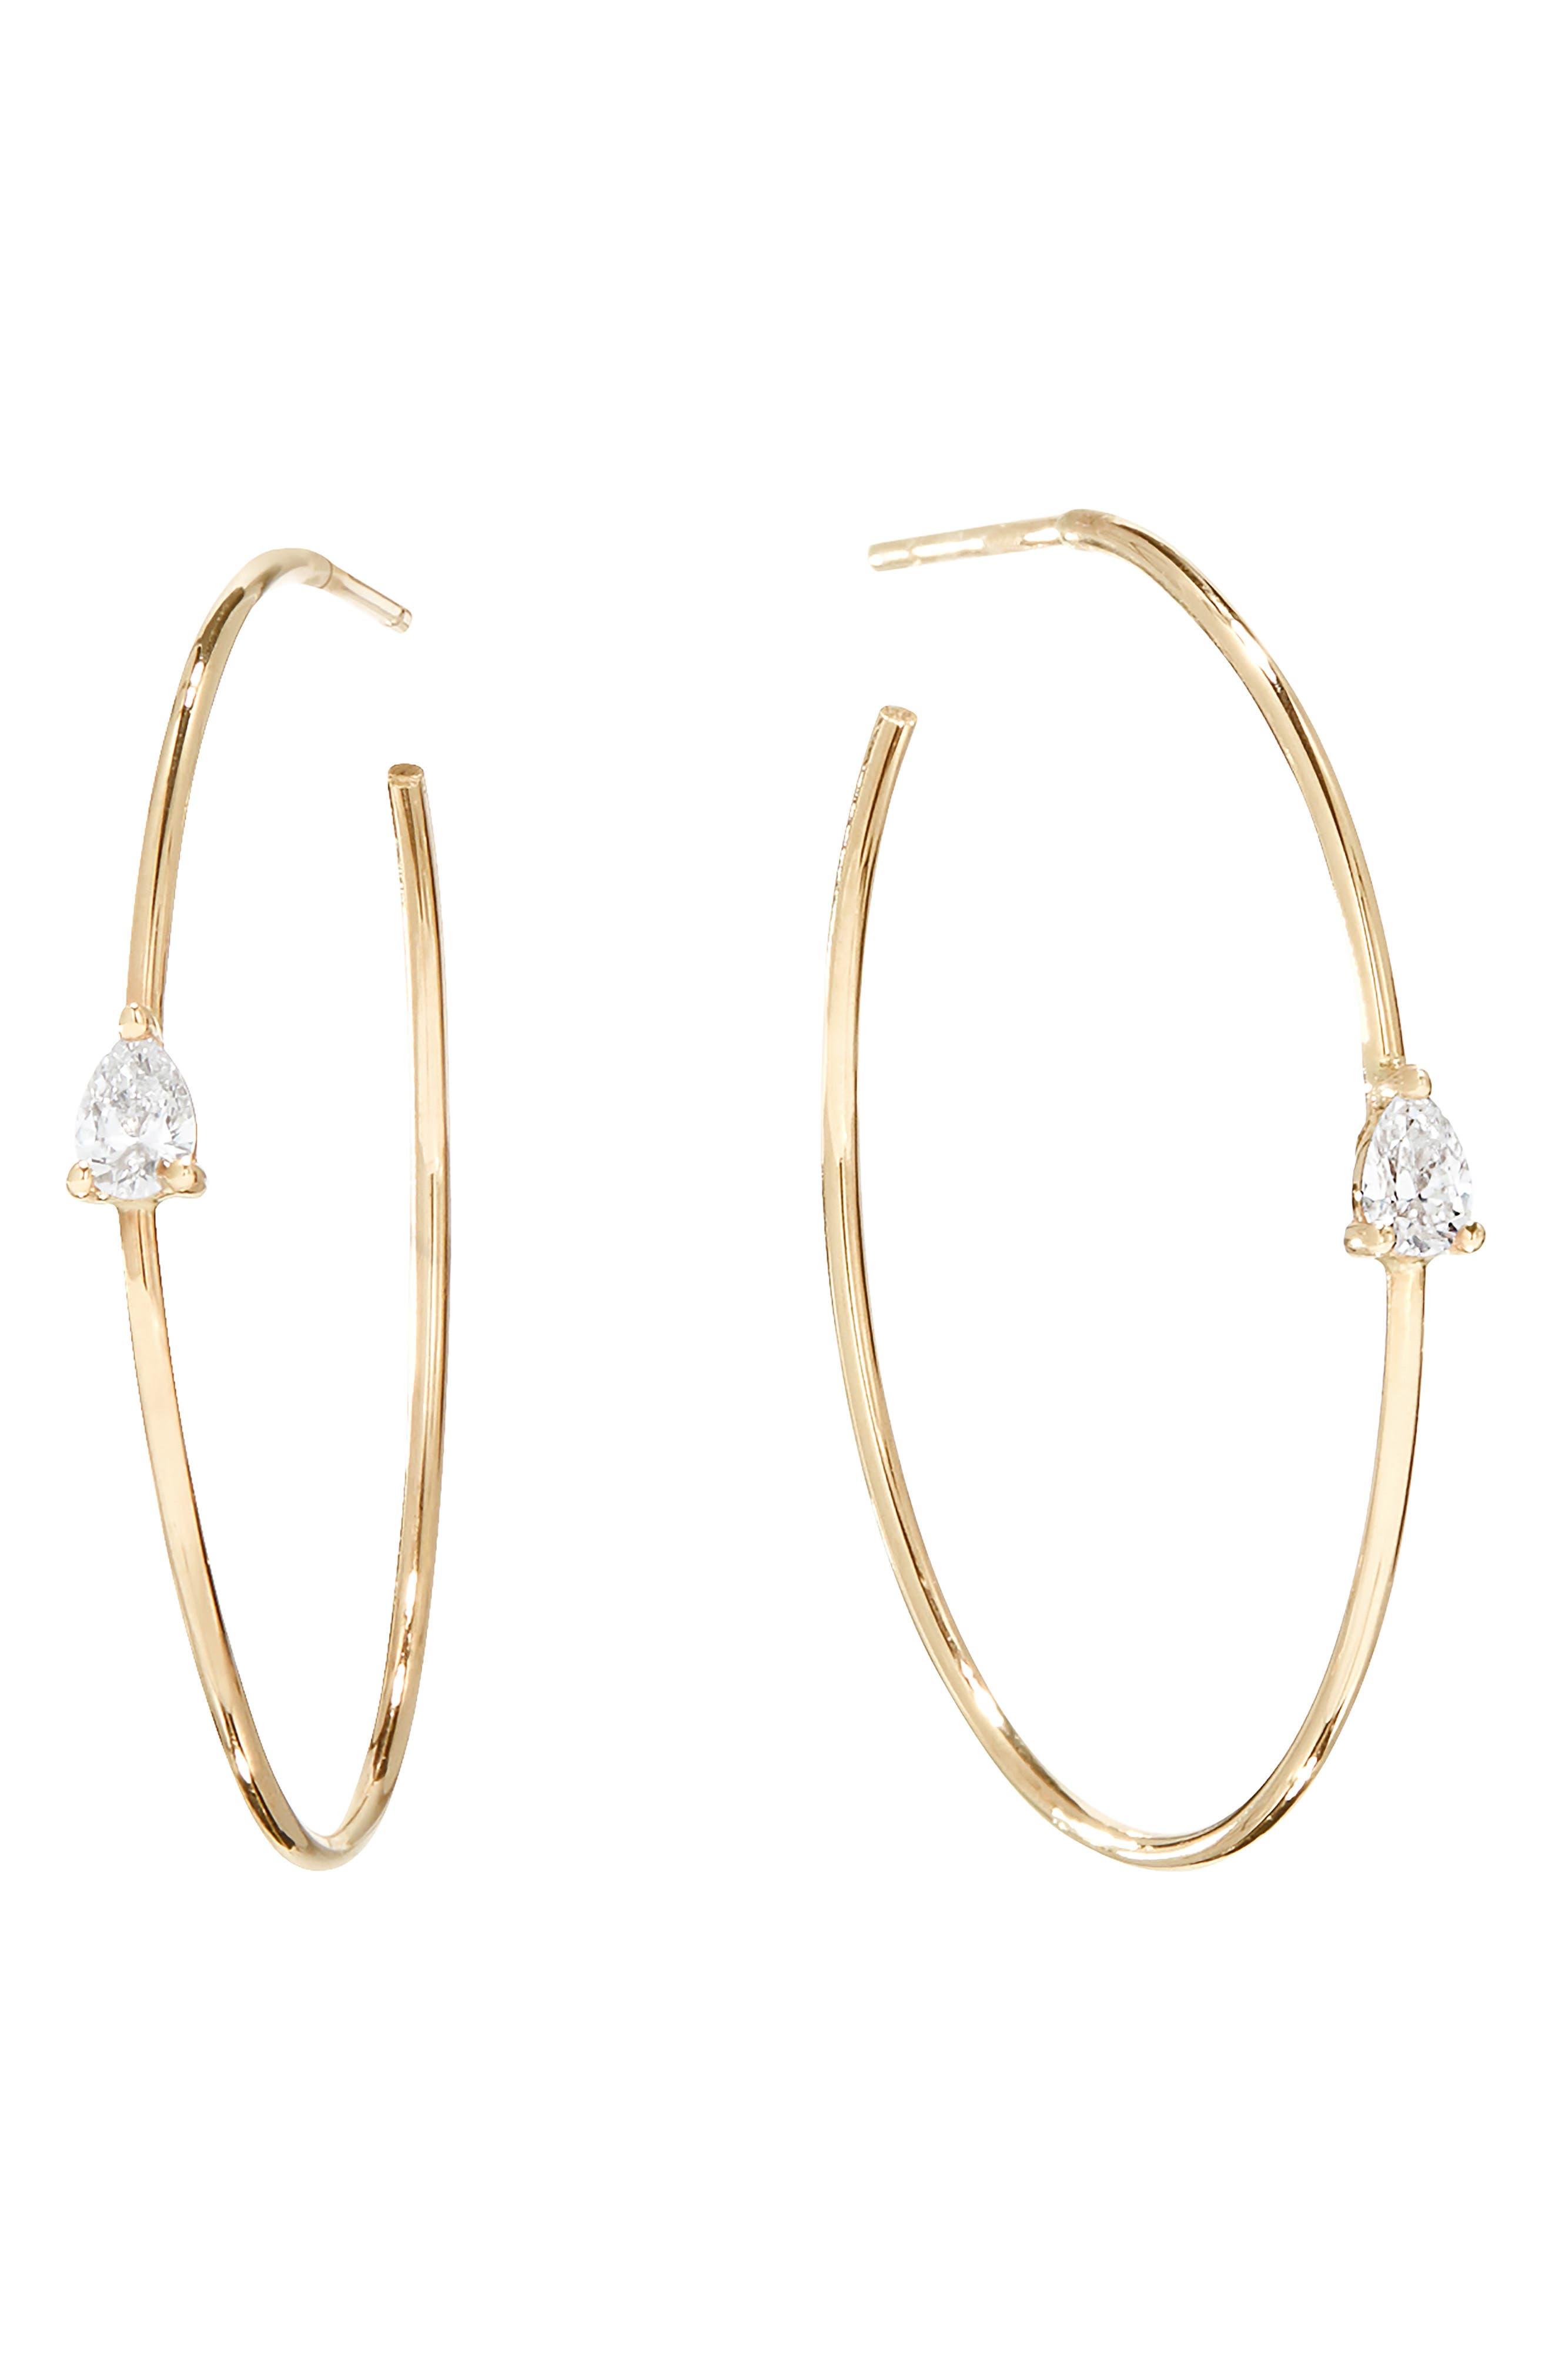 Pear Diamond Hoop Earrings,                             Main thumbnail 1, color,                             GOLD